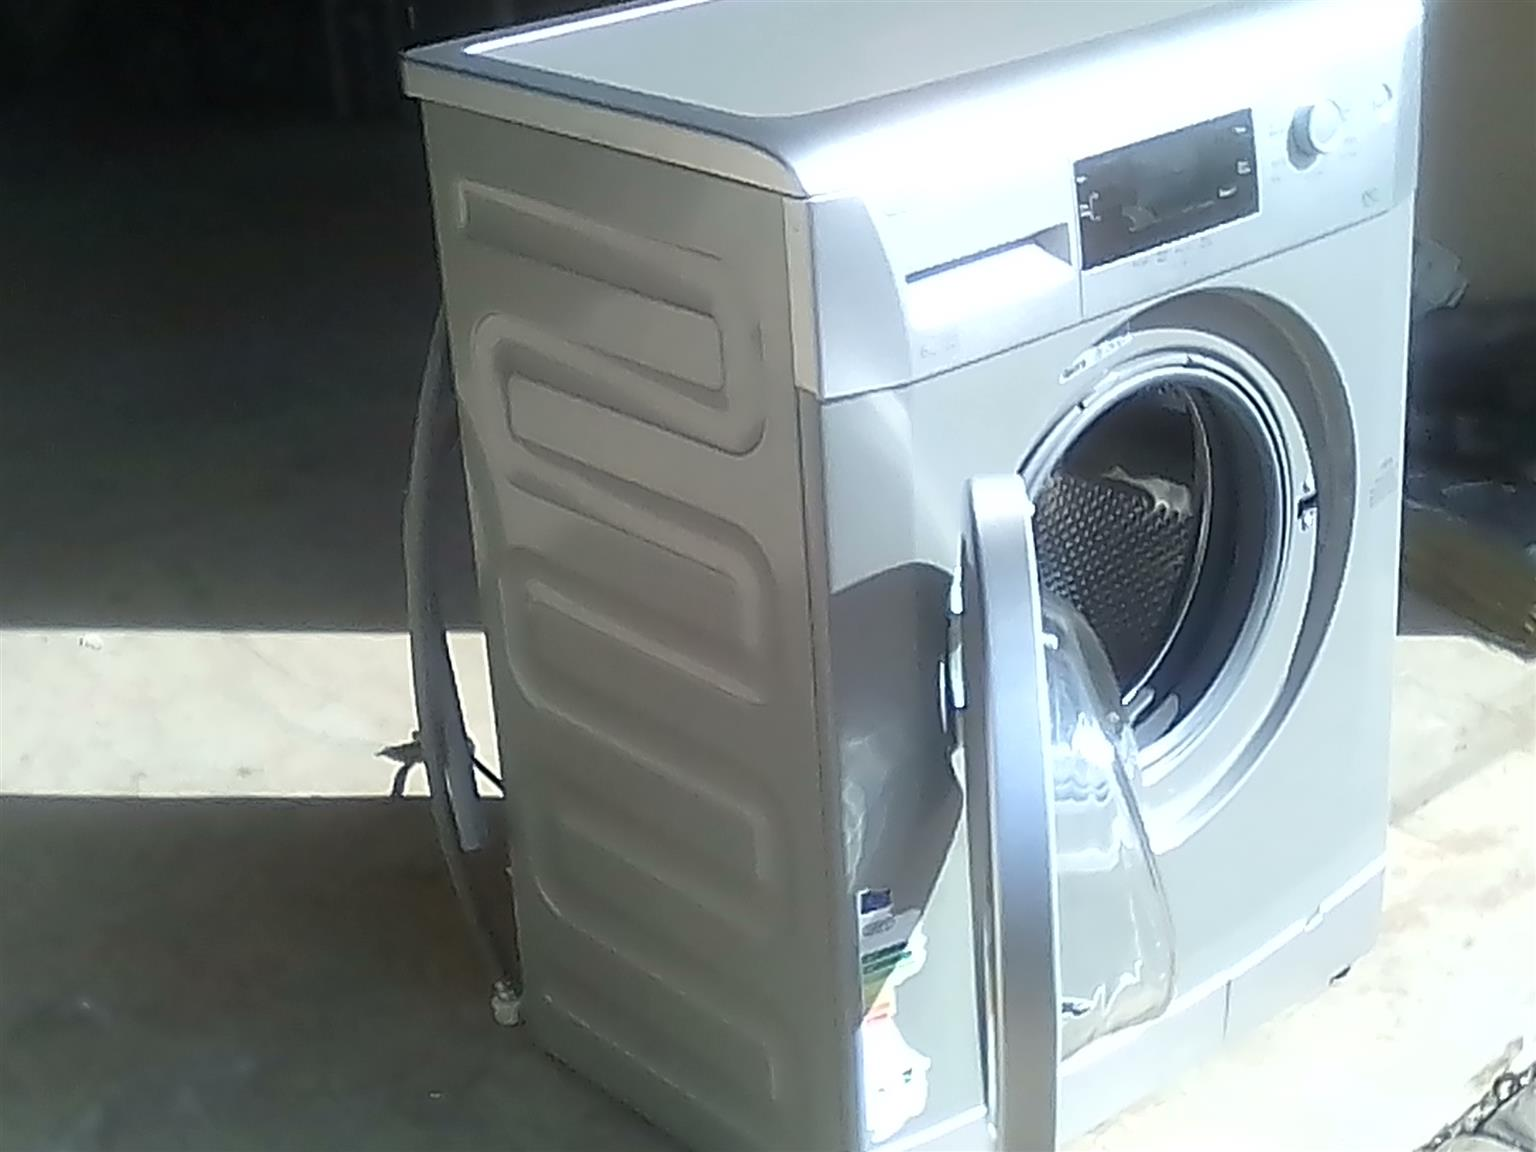 Defy ECO Washing Machine